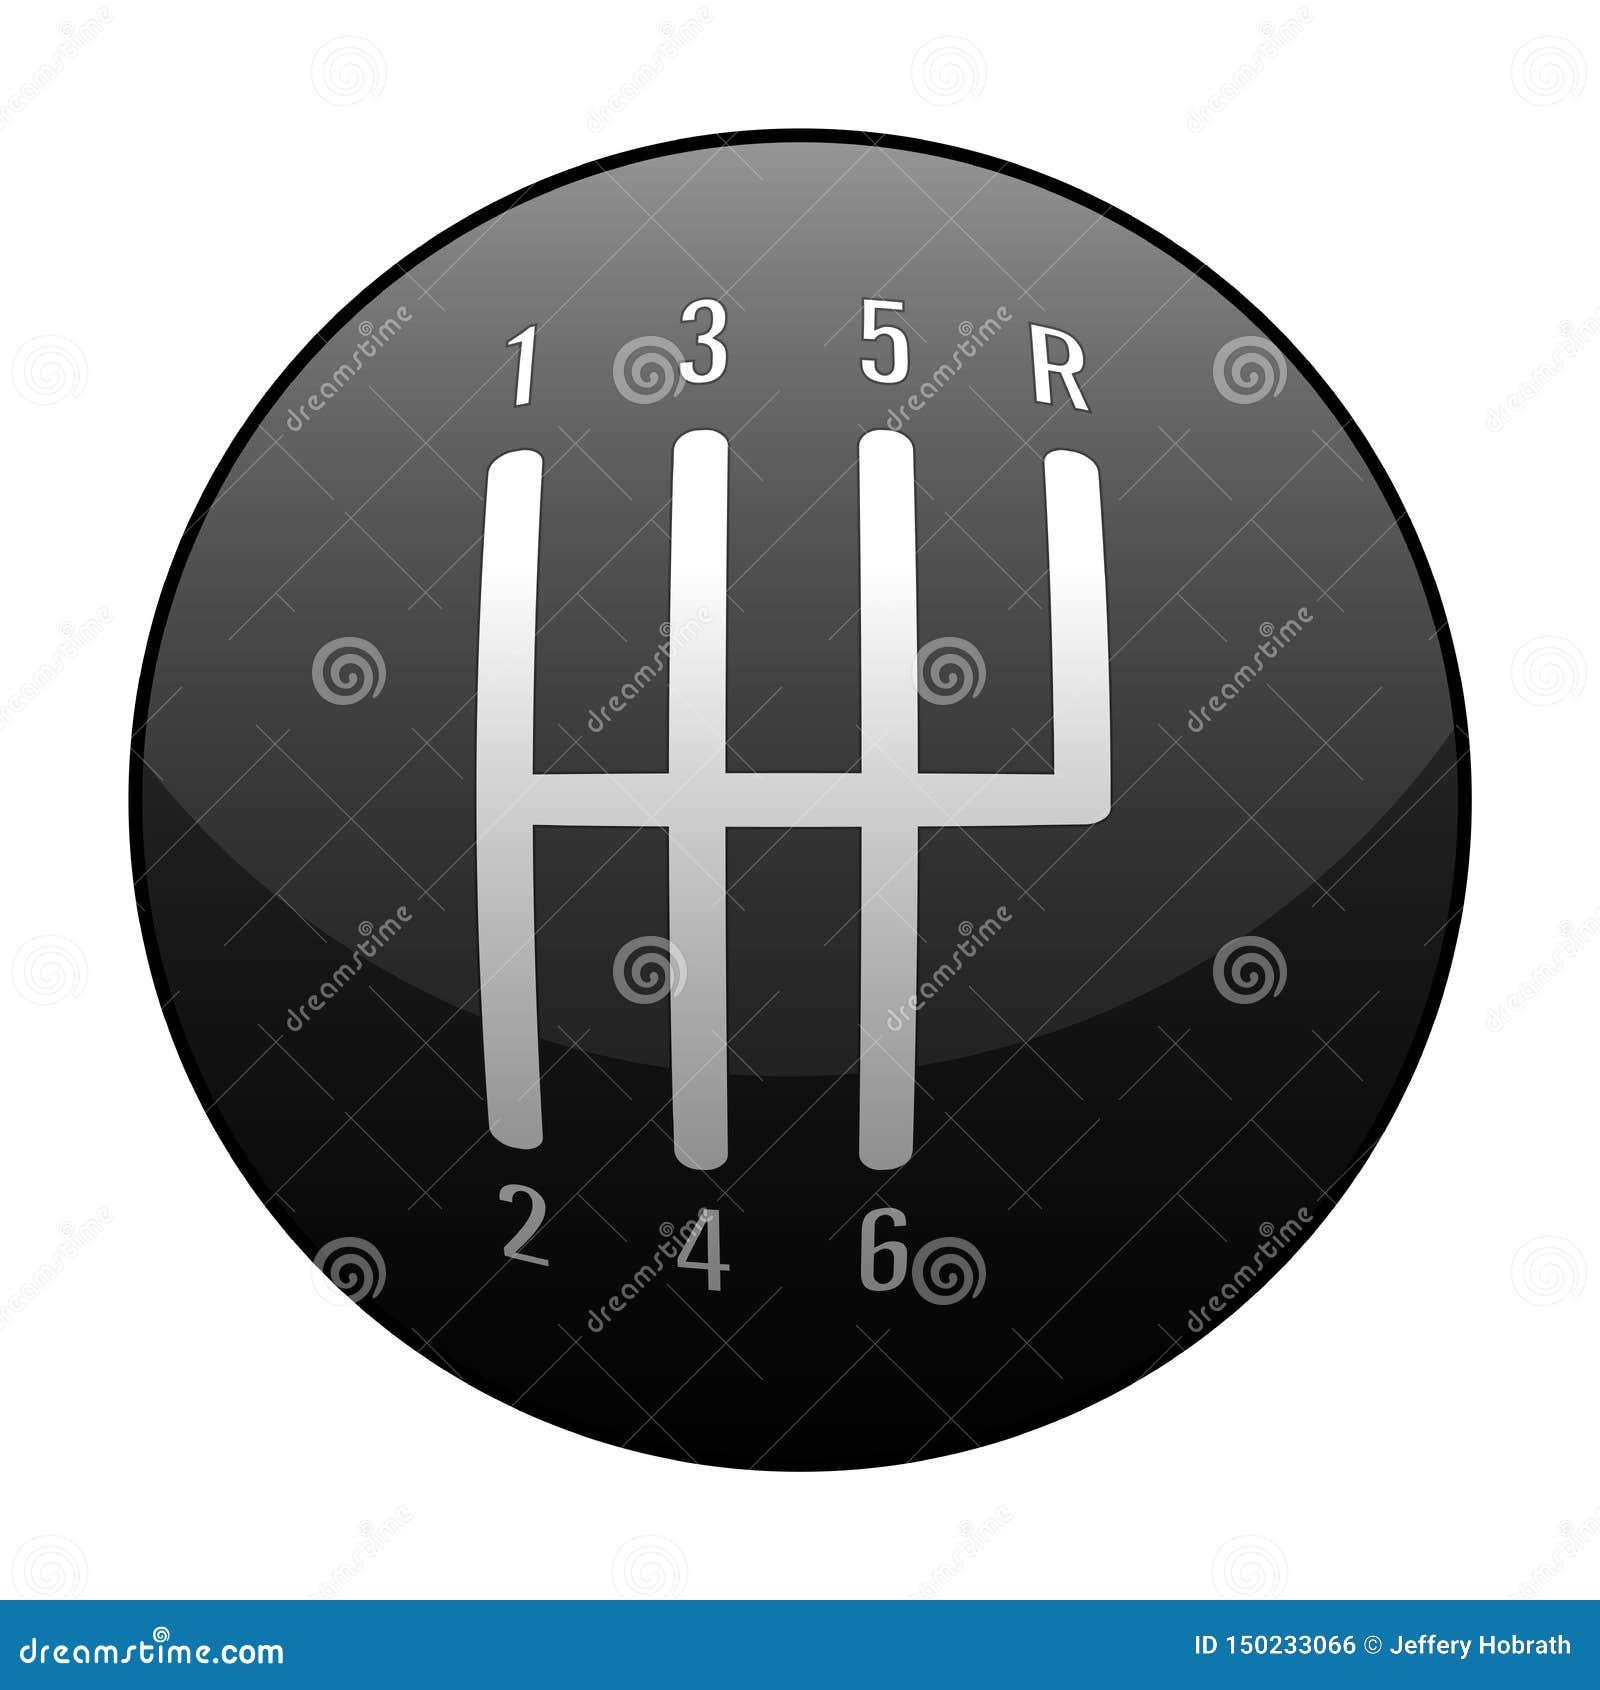 Automotive Standard Manual Transmission 6 Speed Shift Knob Vector Illustration